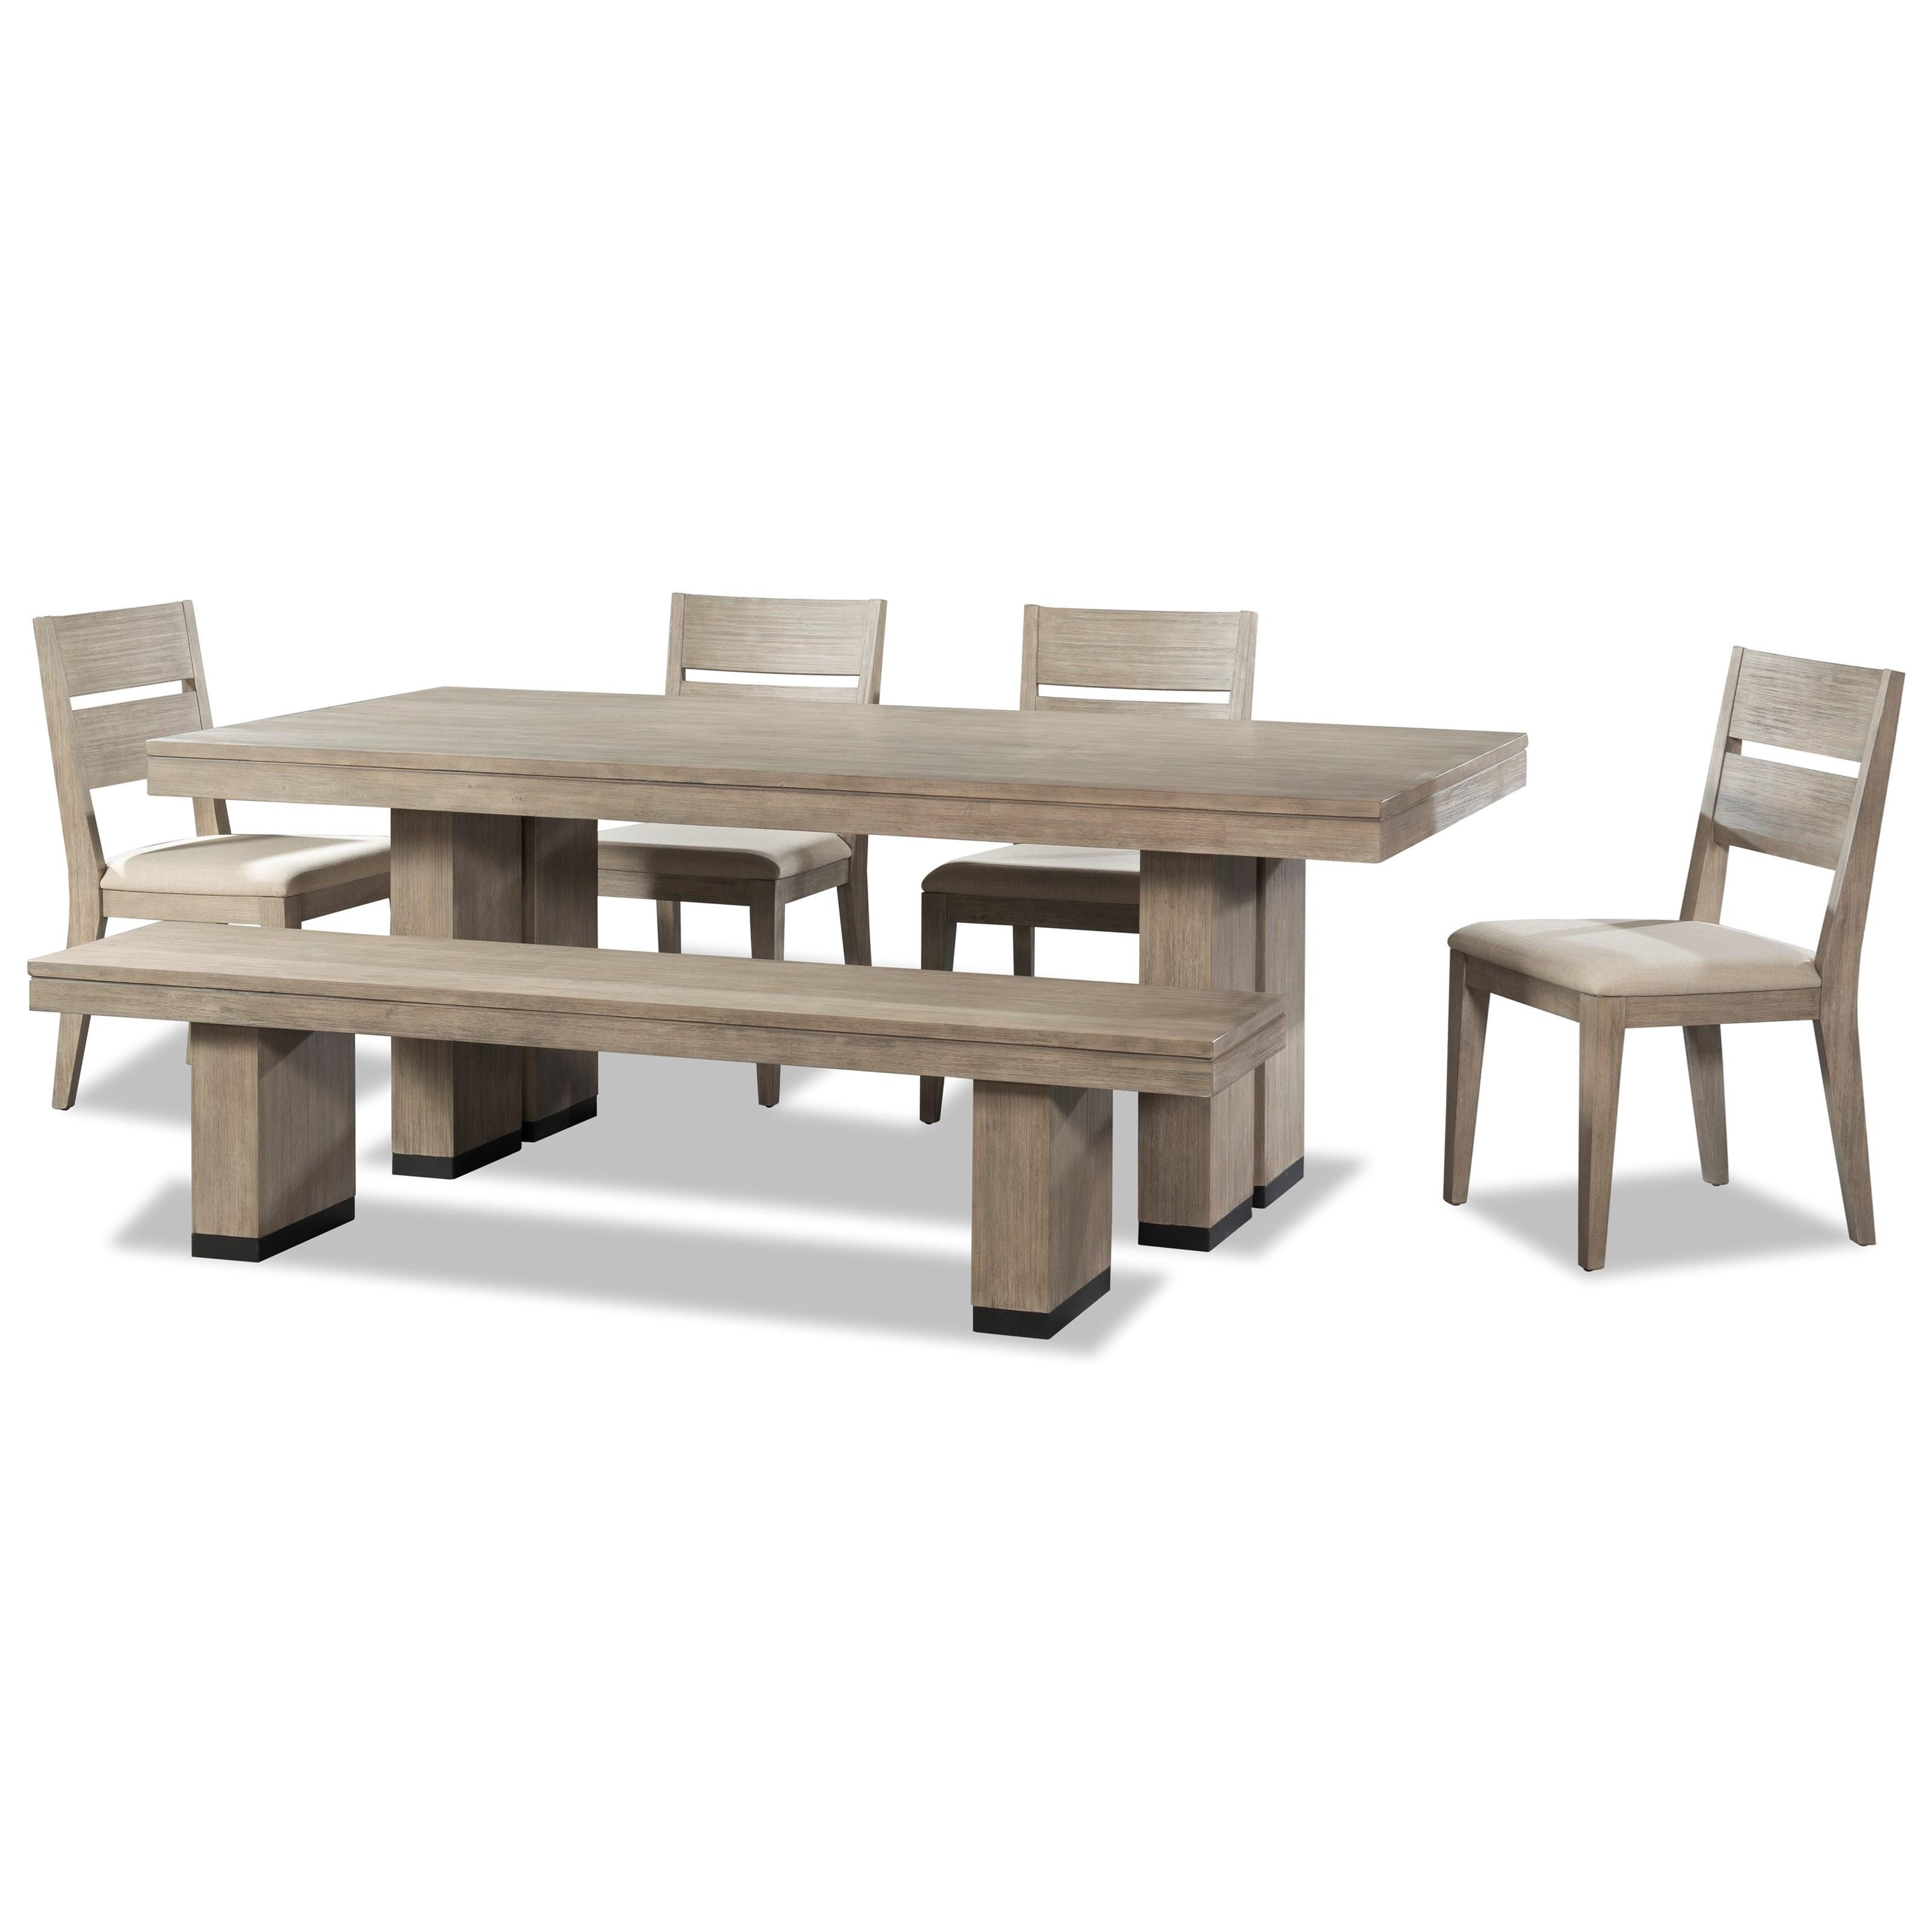 Cresent Fine Furniture Larkspur 6 Piece Trestle Table and  : products2Fcresentfinefurniture2Fcolor2Flarkspur20503503 1502B4x1582B159 b1 from www.jacksonvillefurnituremart.com size 3200 x 3200 jpeg 563kB